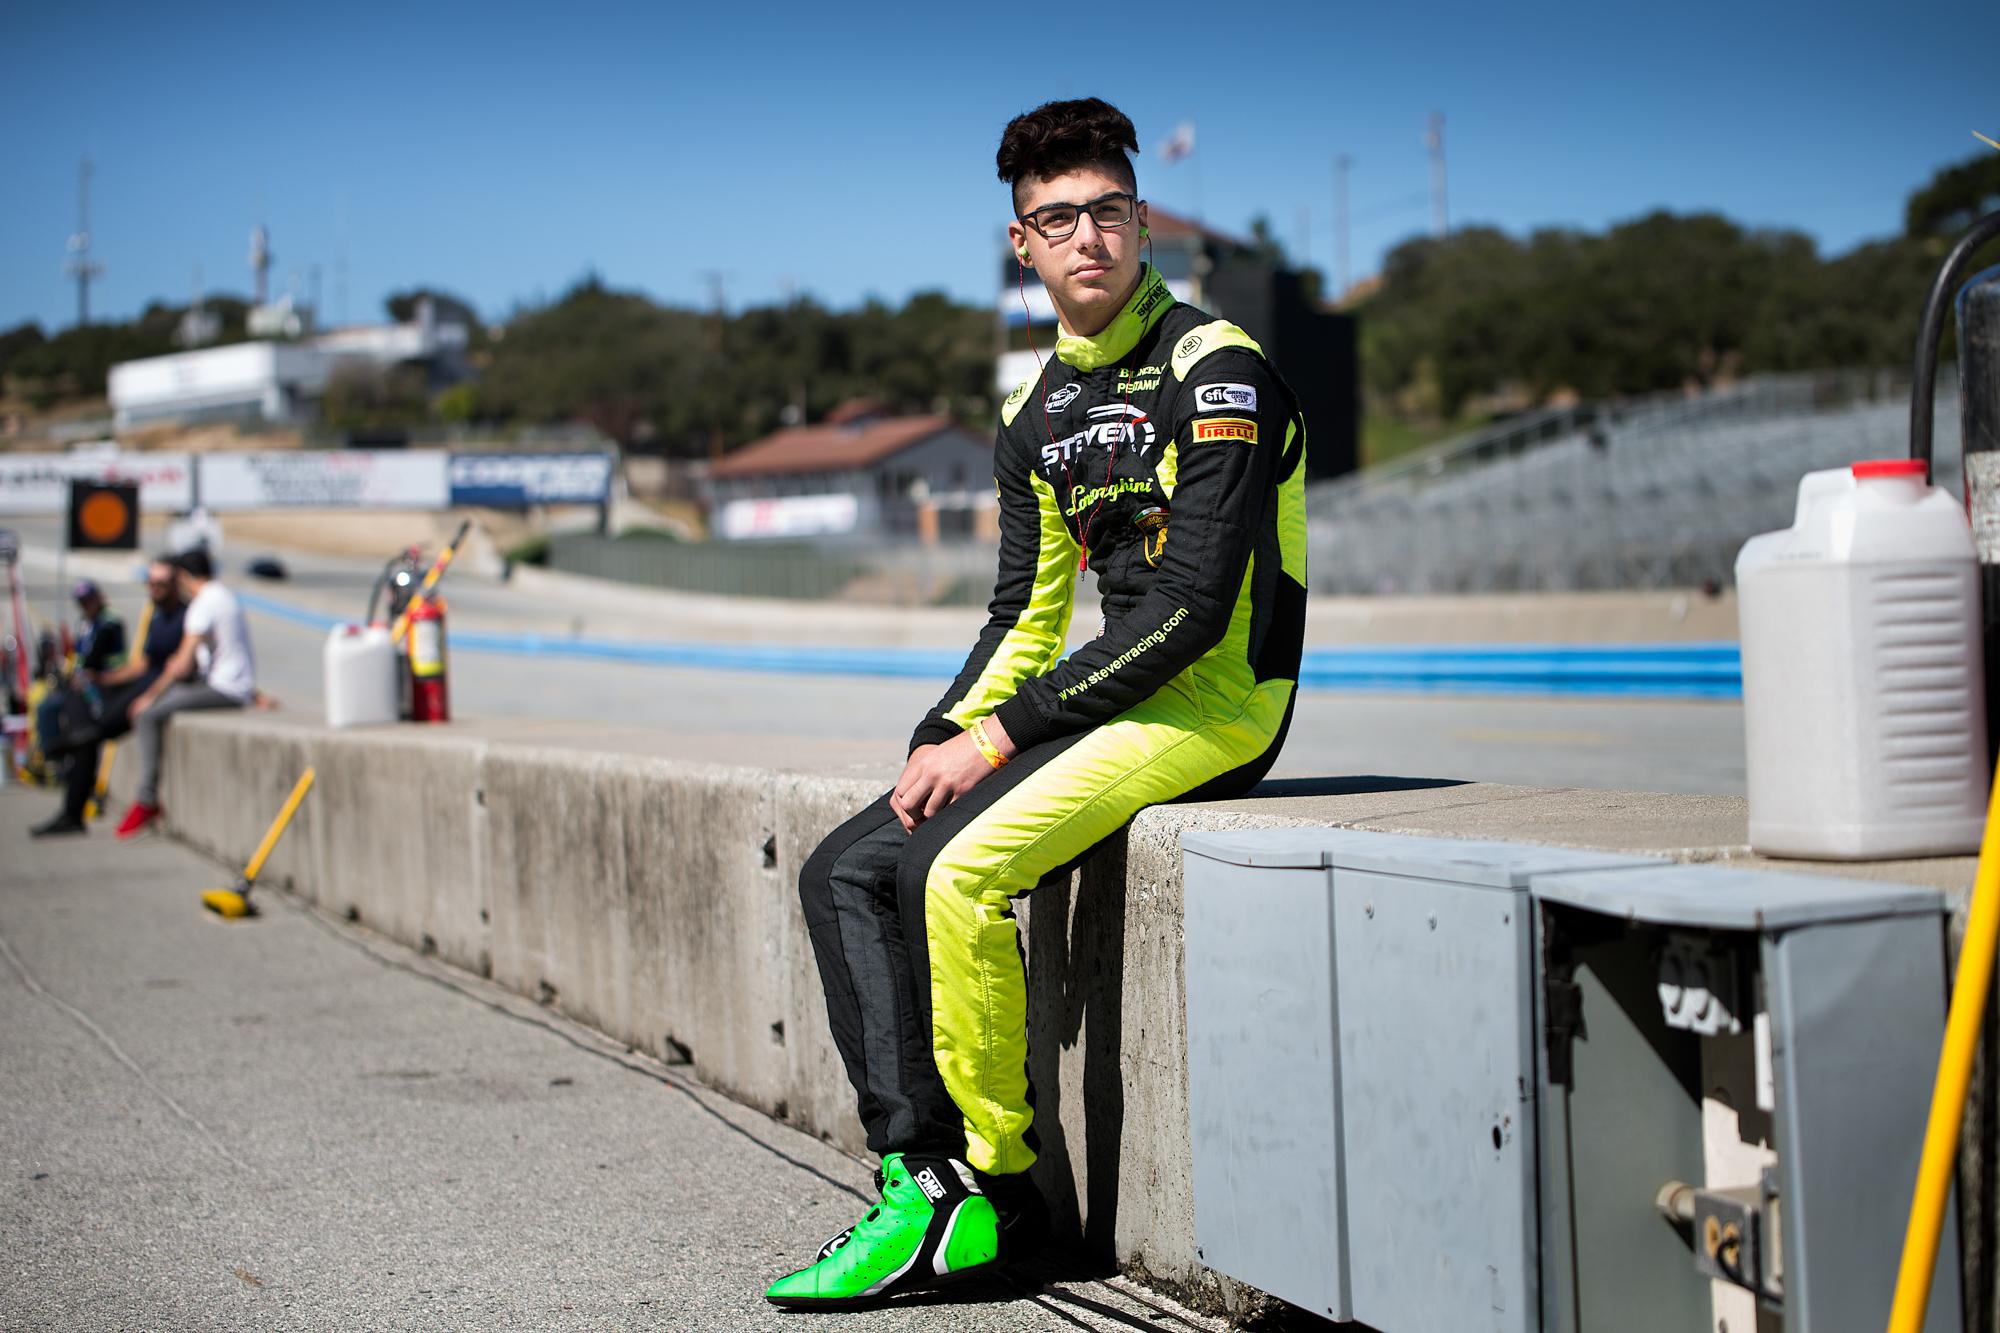 Steven-Racing-Laguna-20180601-96333.jpg